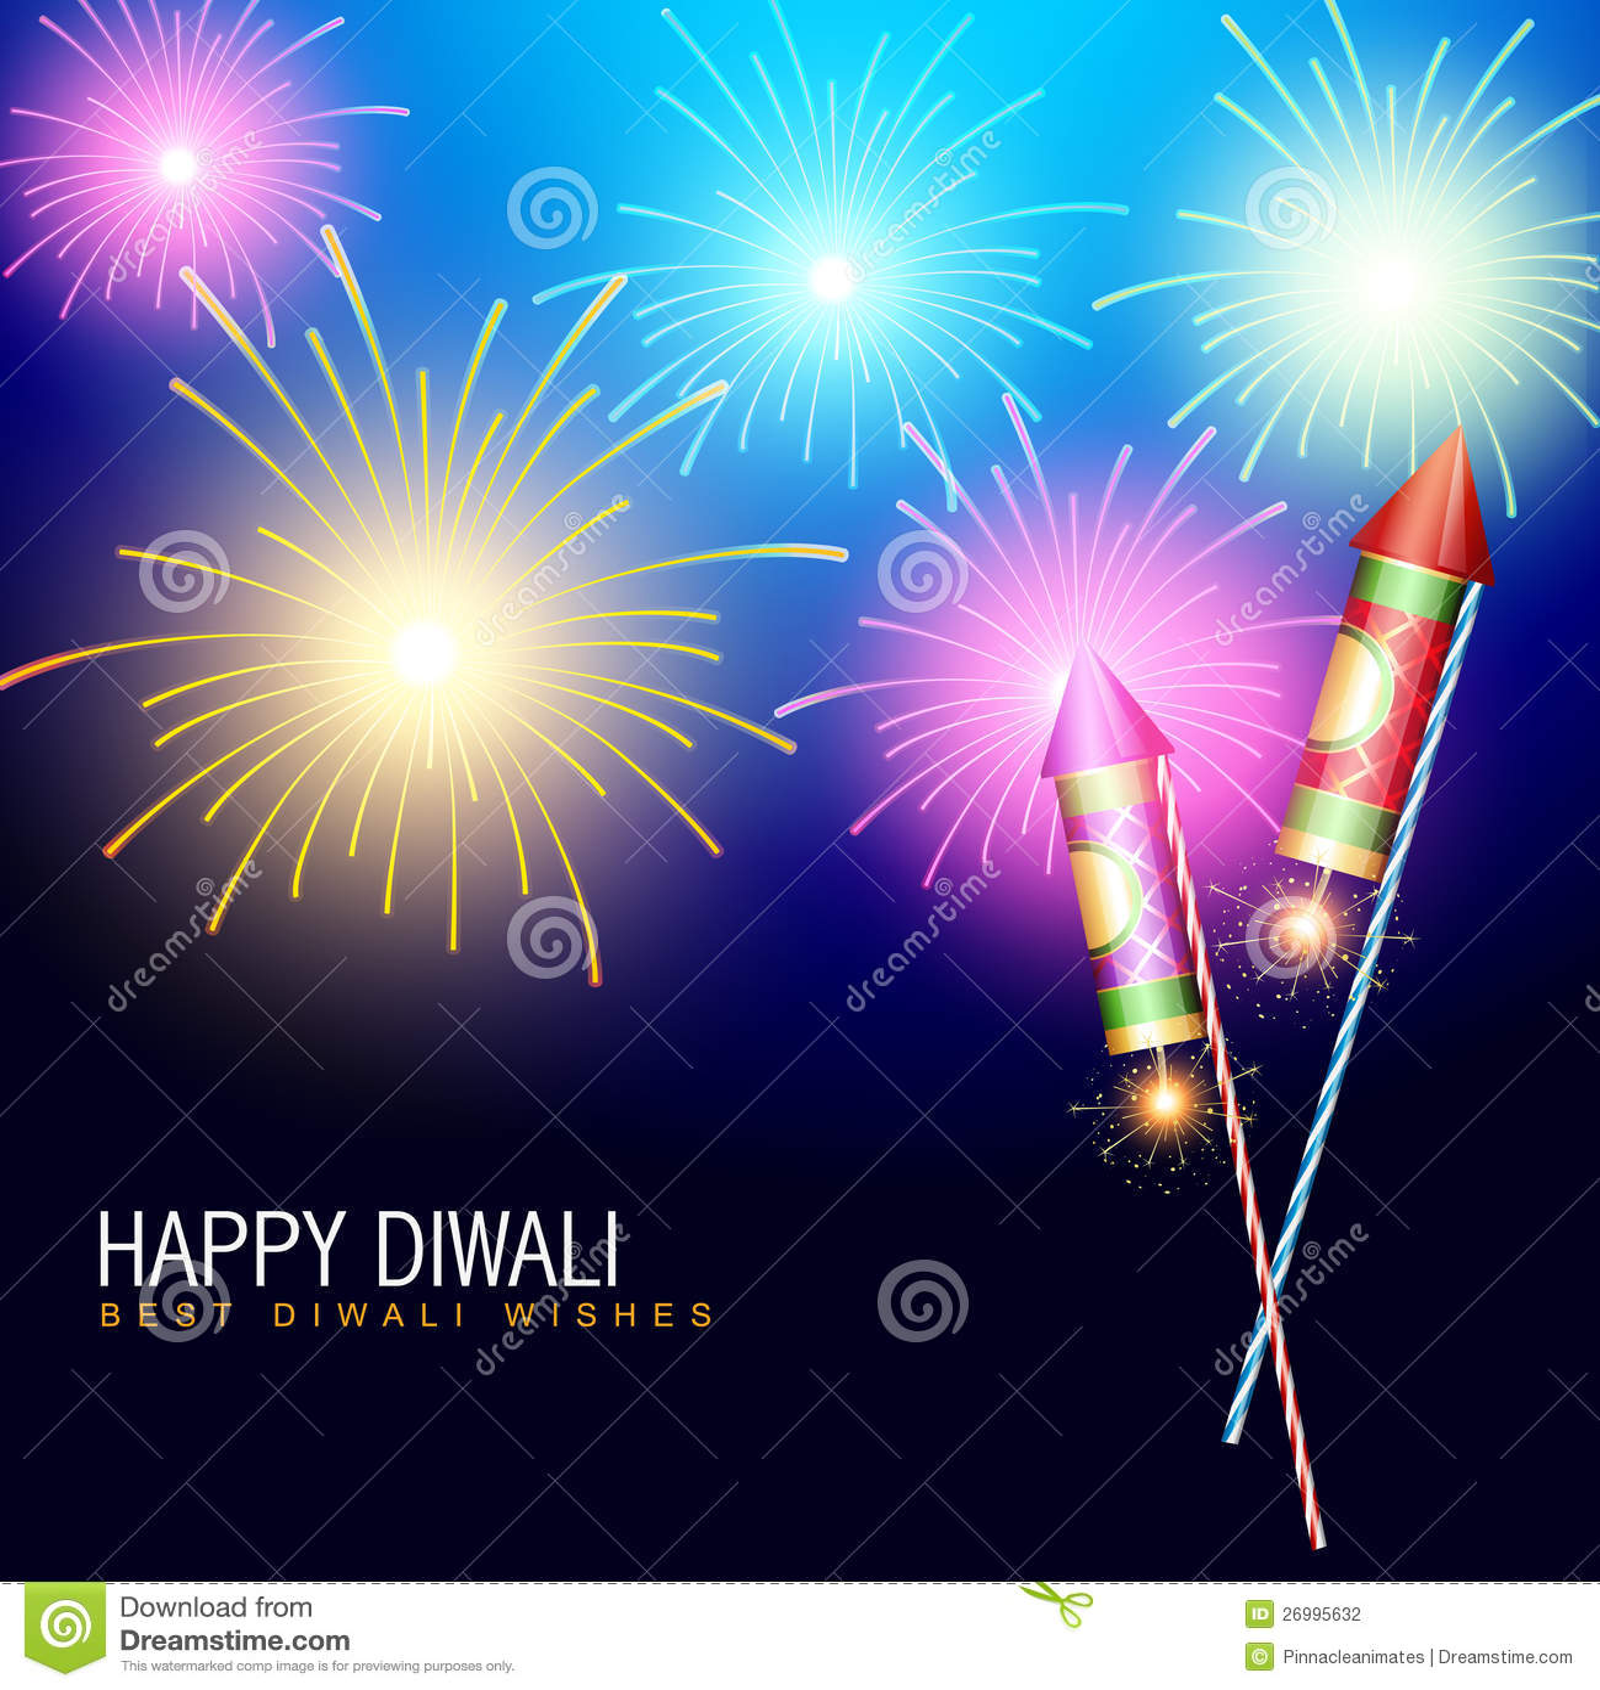 Diya Wallpaper Hd Diwali Fireworks Stock Photography Image 26995632